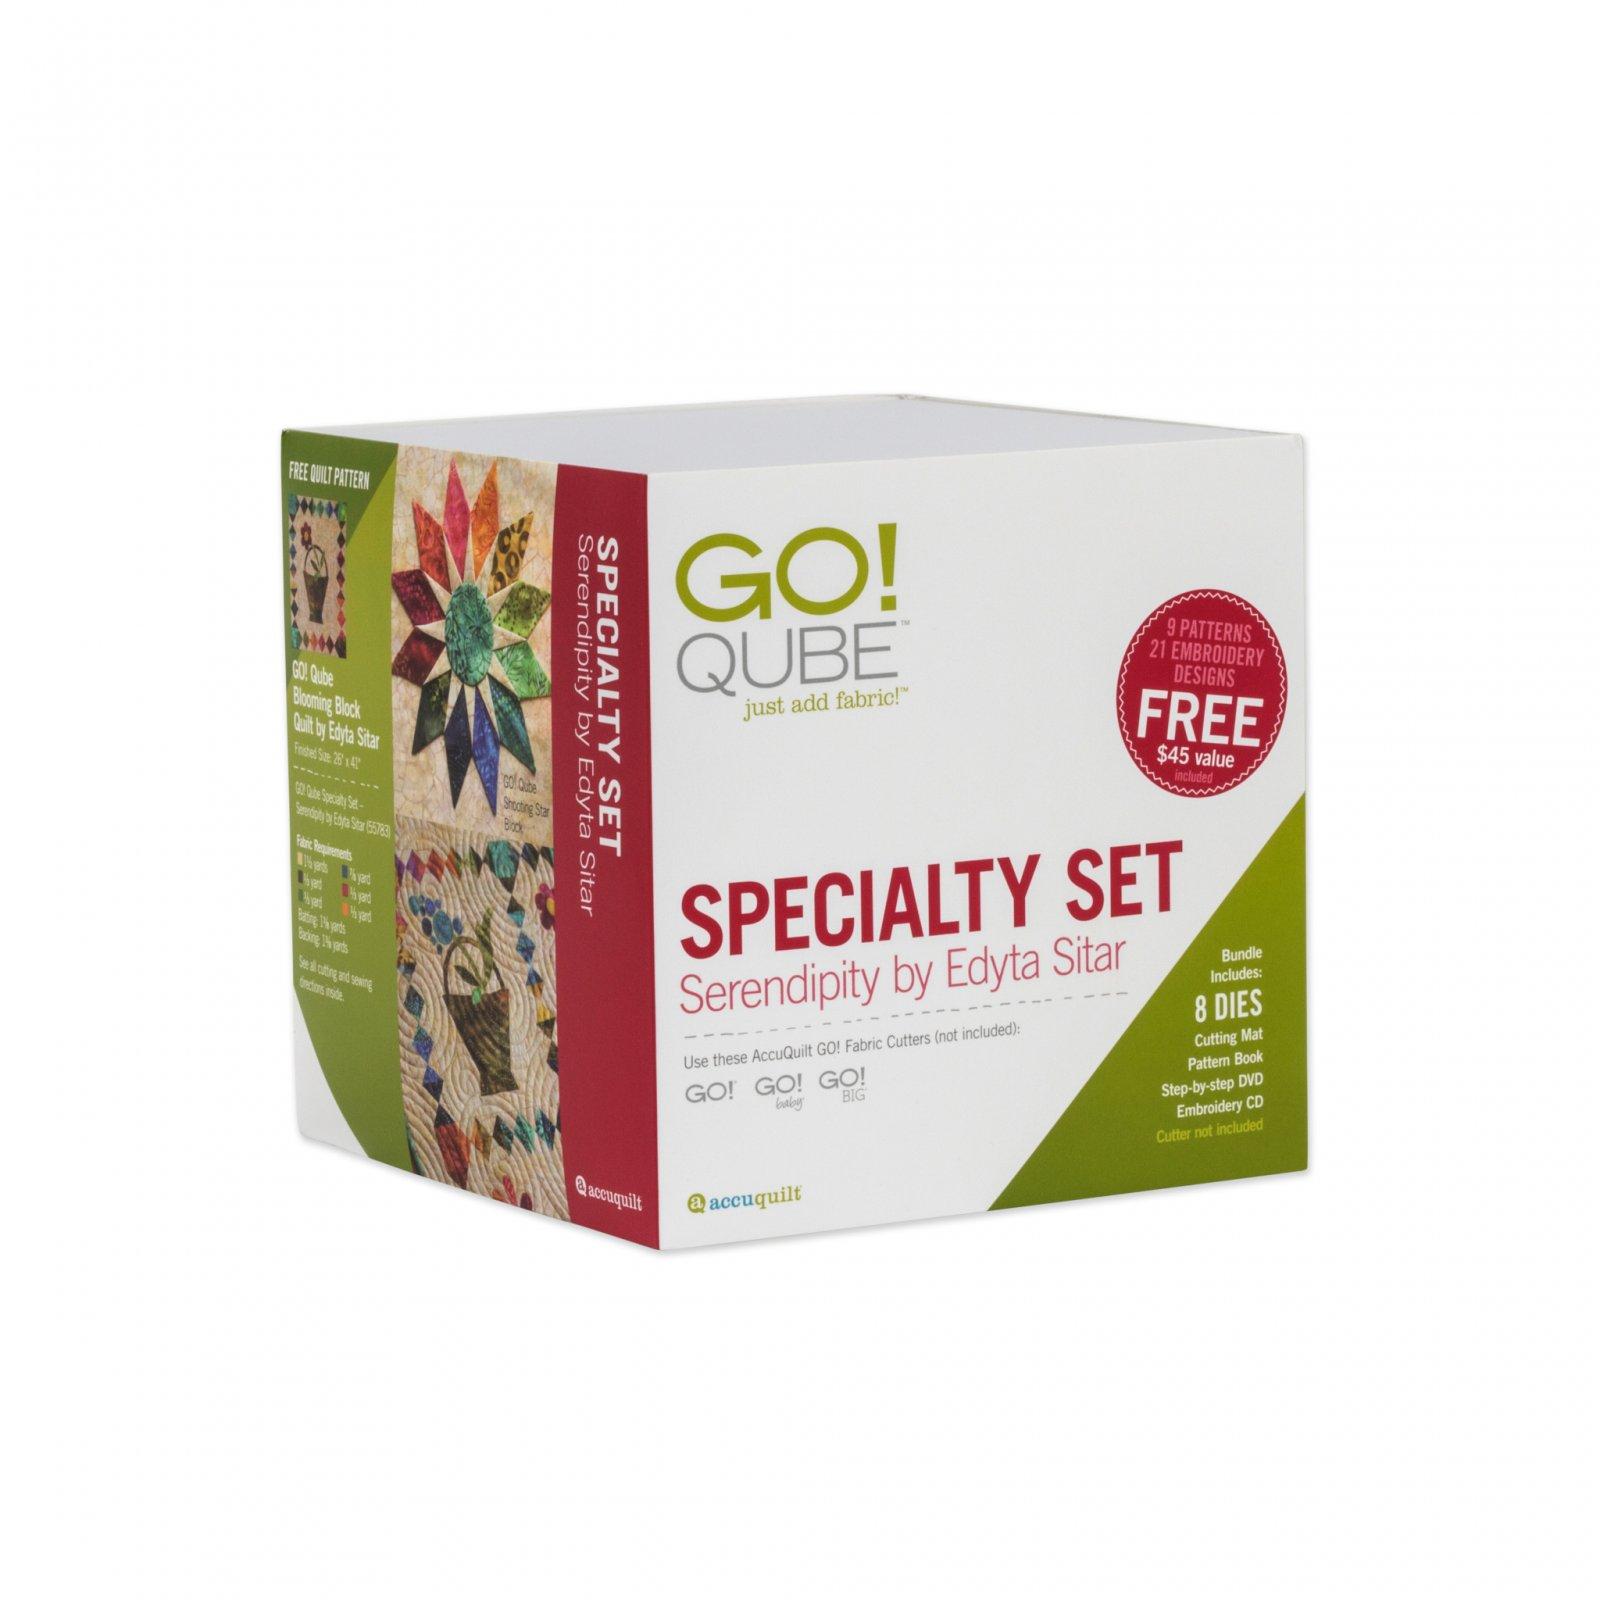 GO! Specialty Set - Serendipity Qube by Edyta Sitar